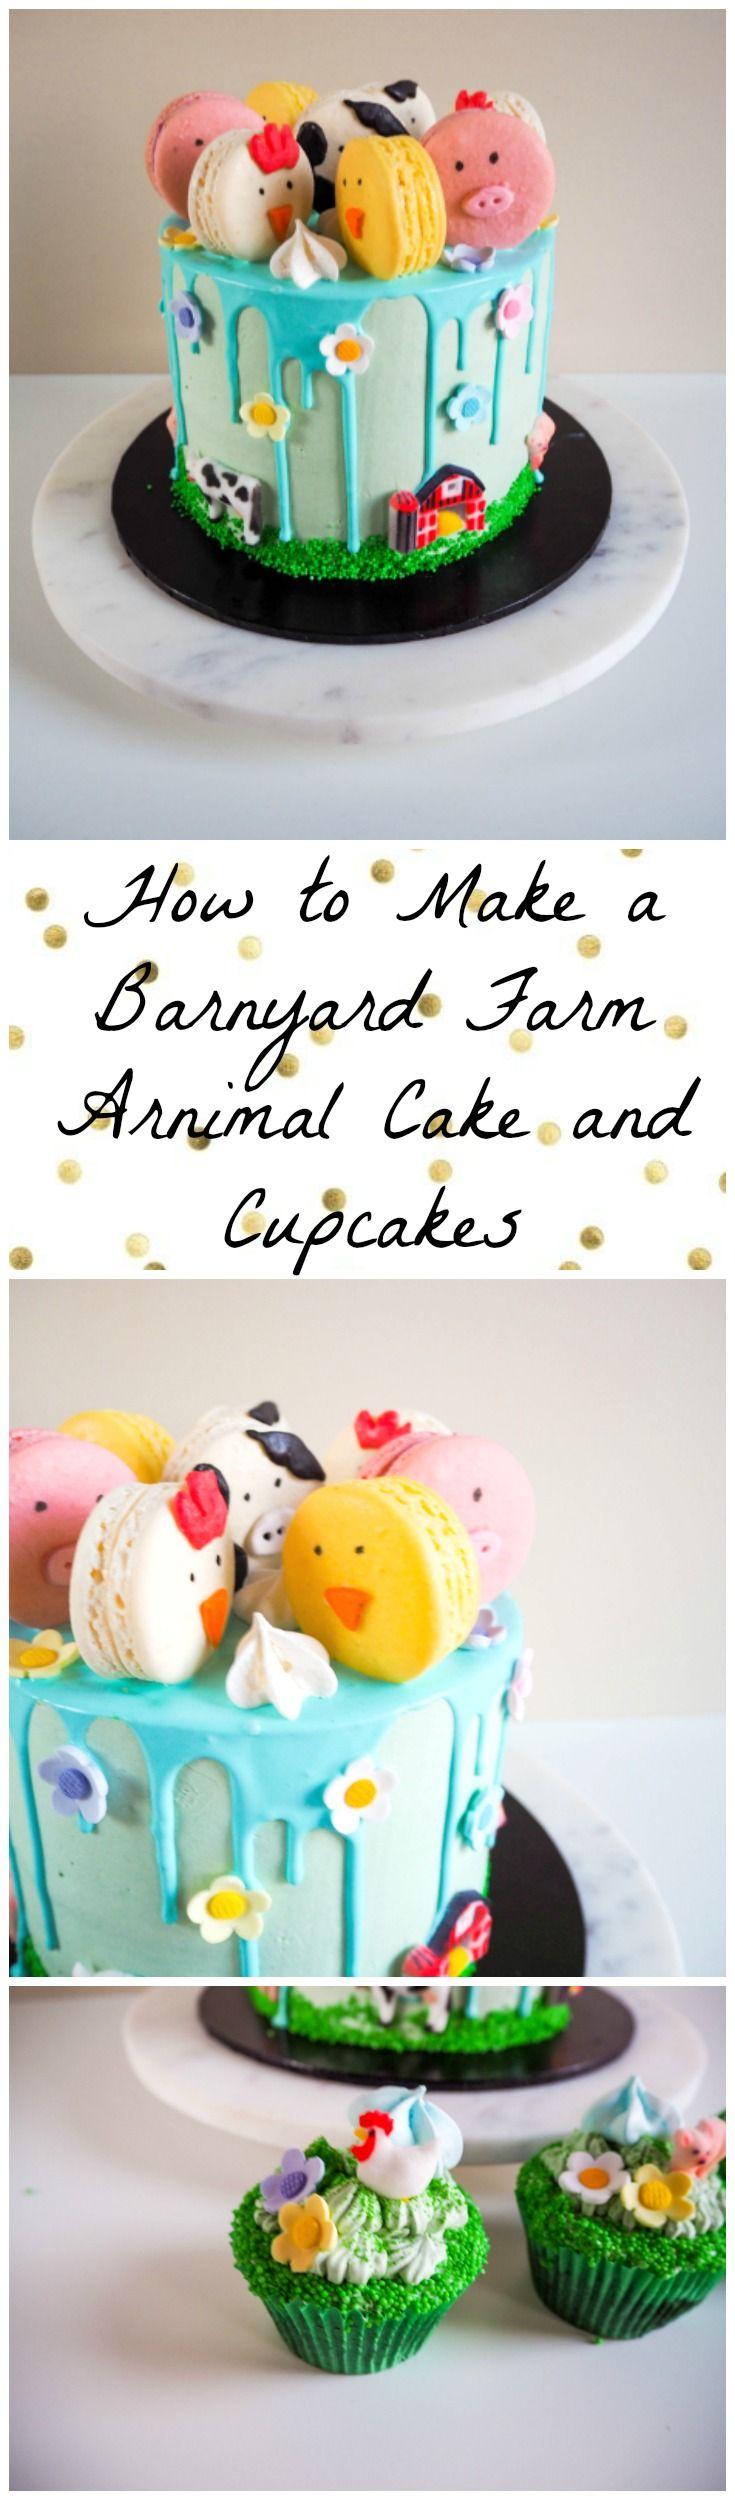 How to make a Barnyard Farm Animal Cake and Cupcakes